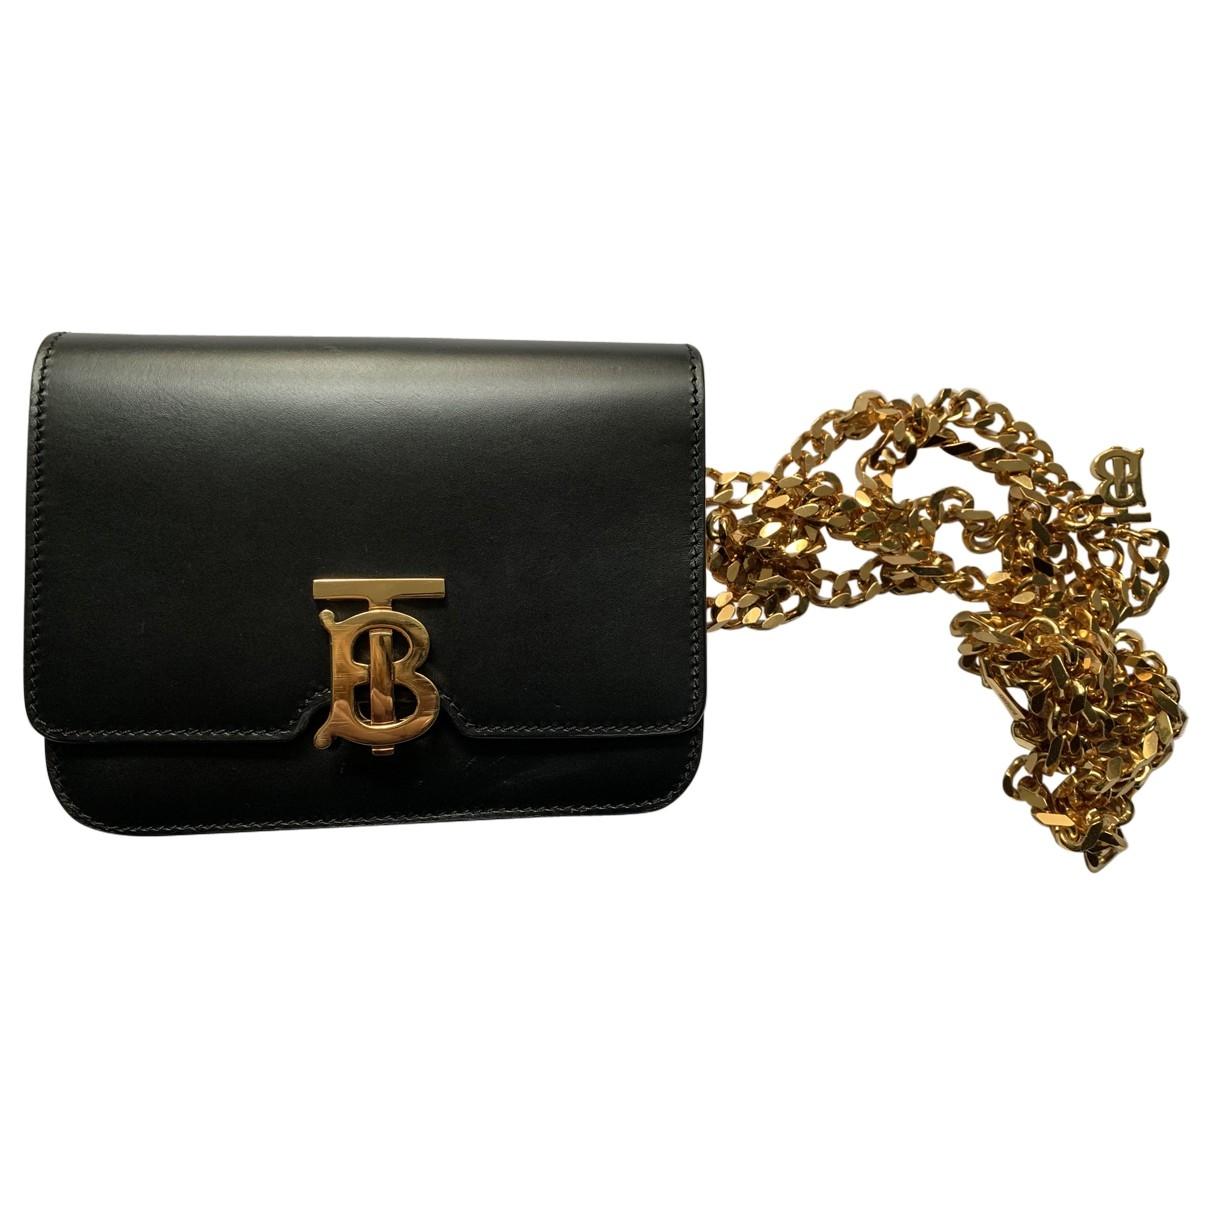 Burberry TB bag Black Leather handbag for Women \N